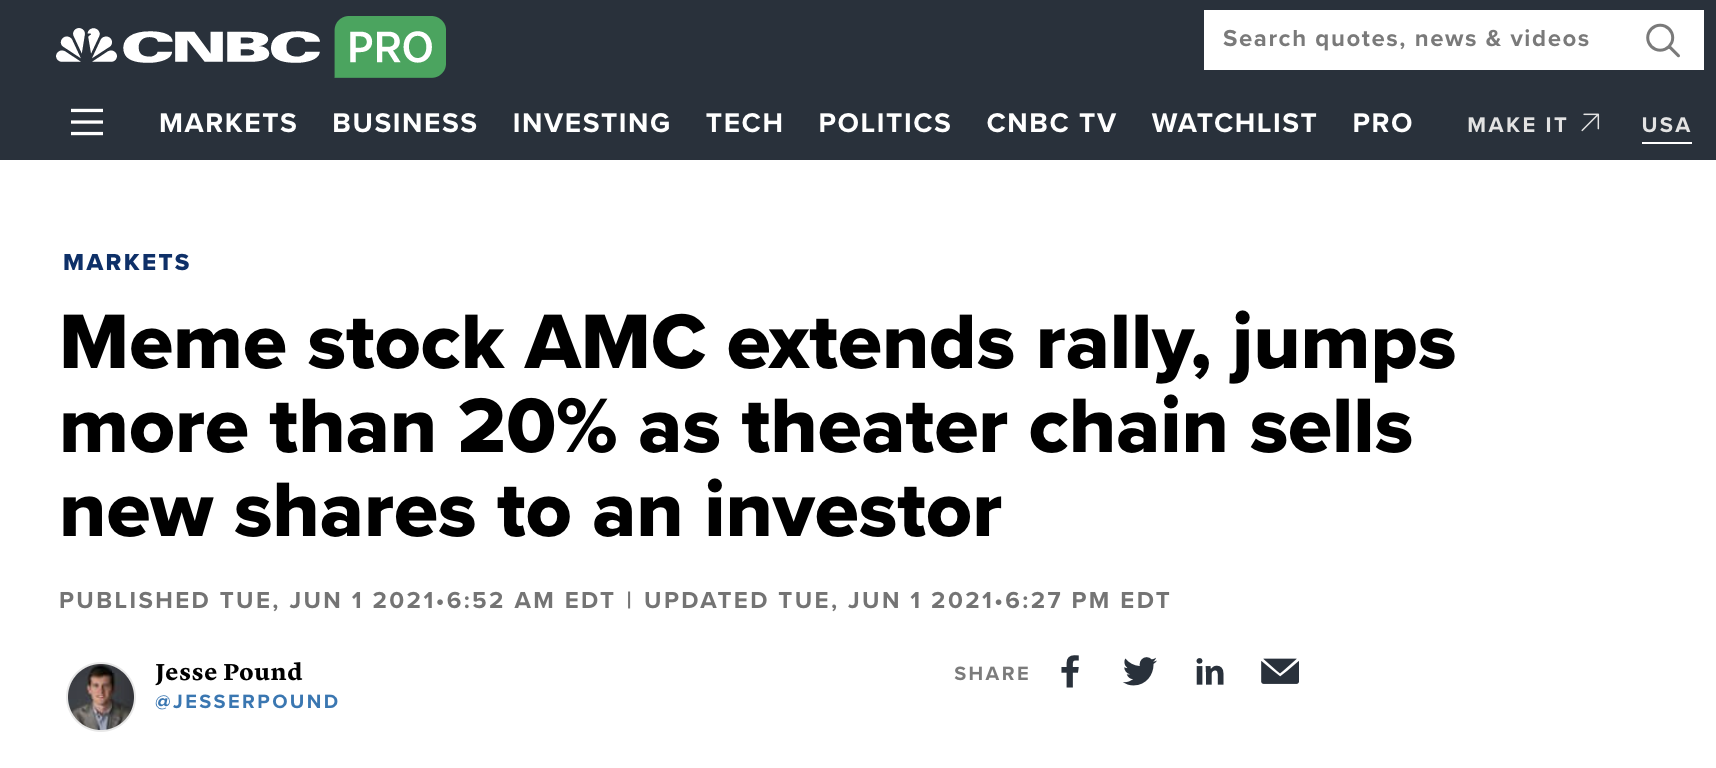 Meme Stock AMC rallies 20%